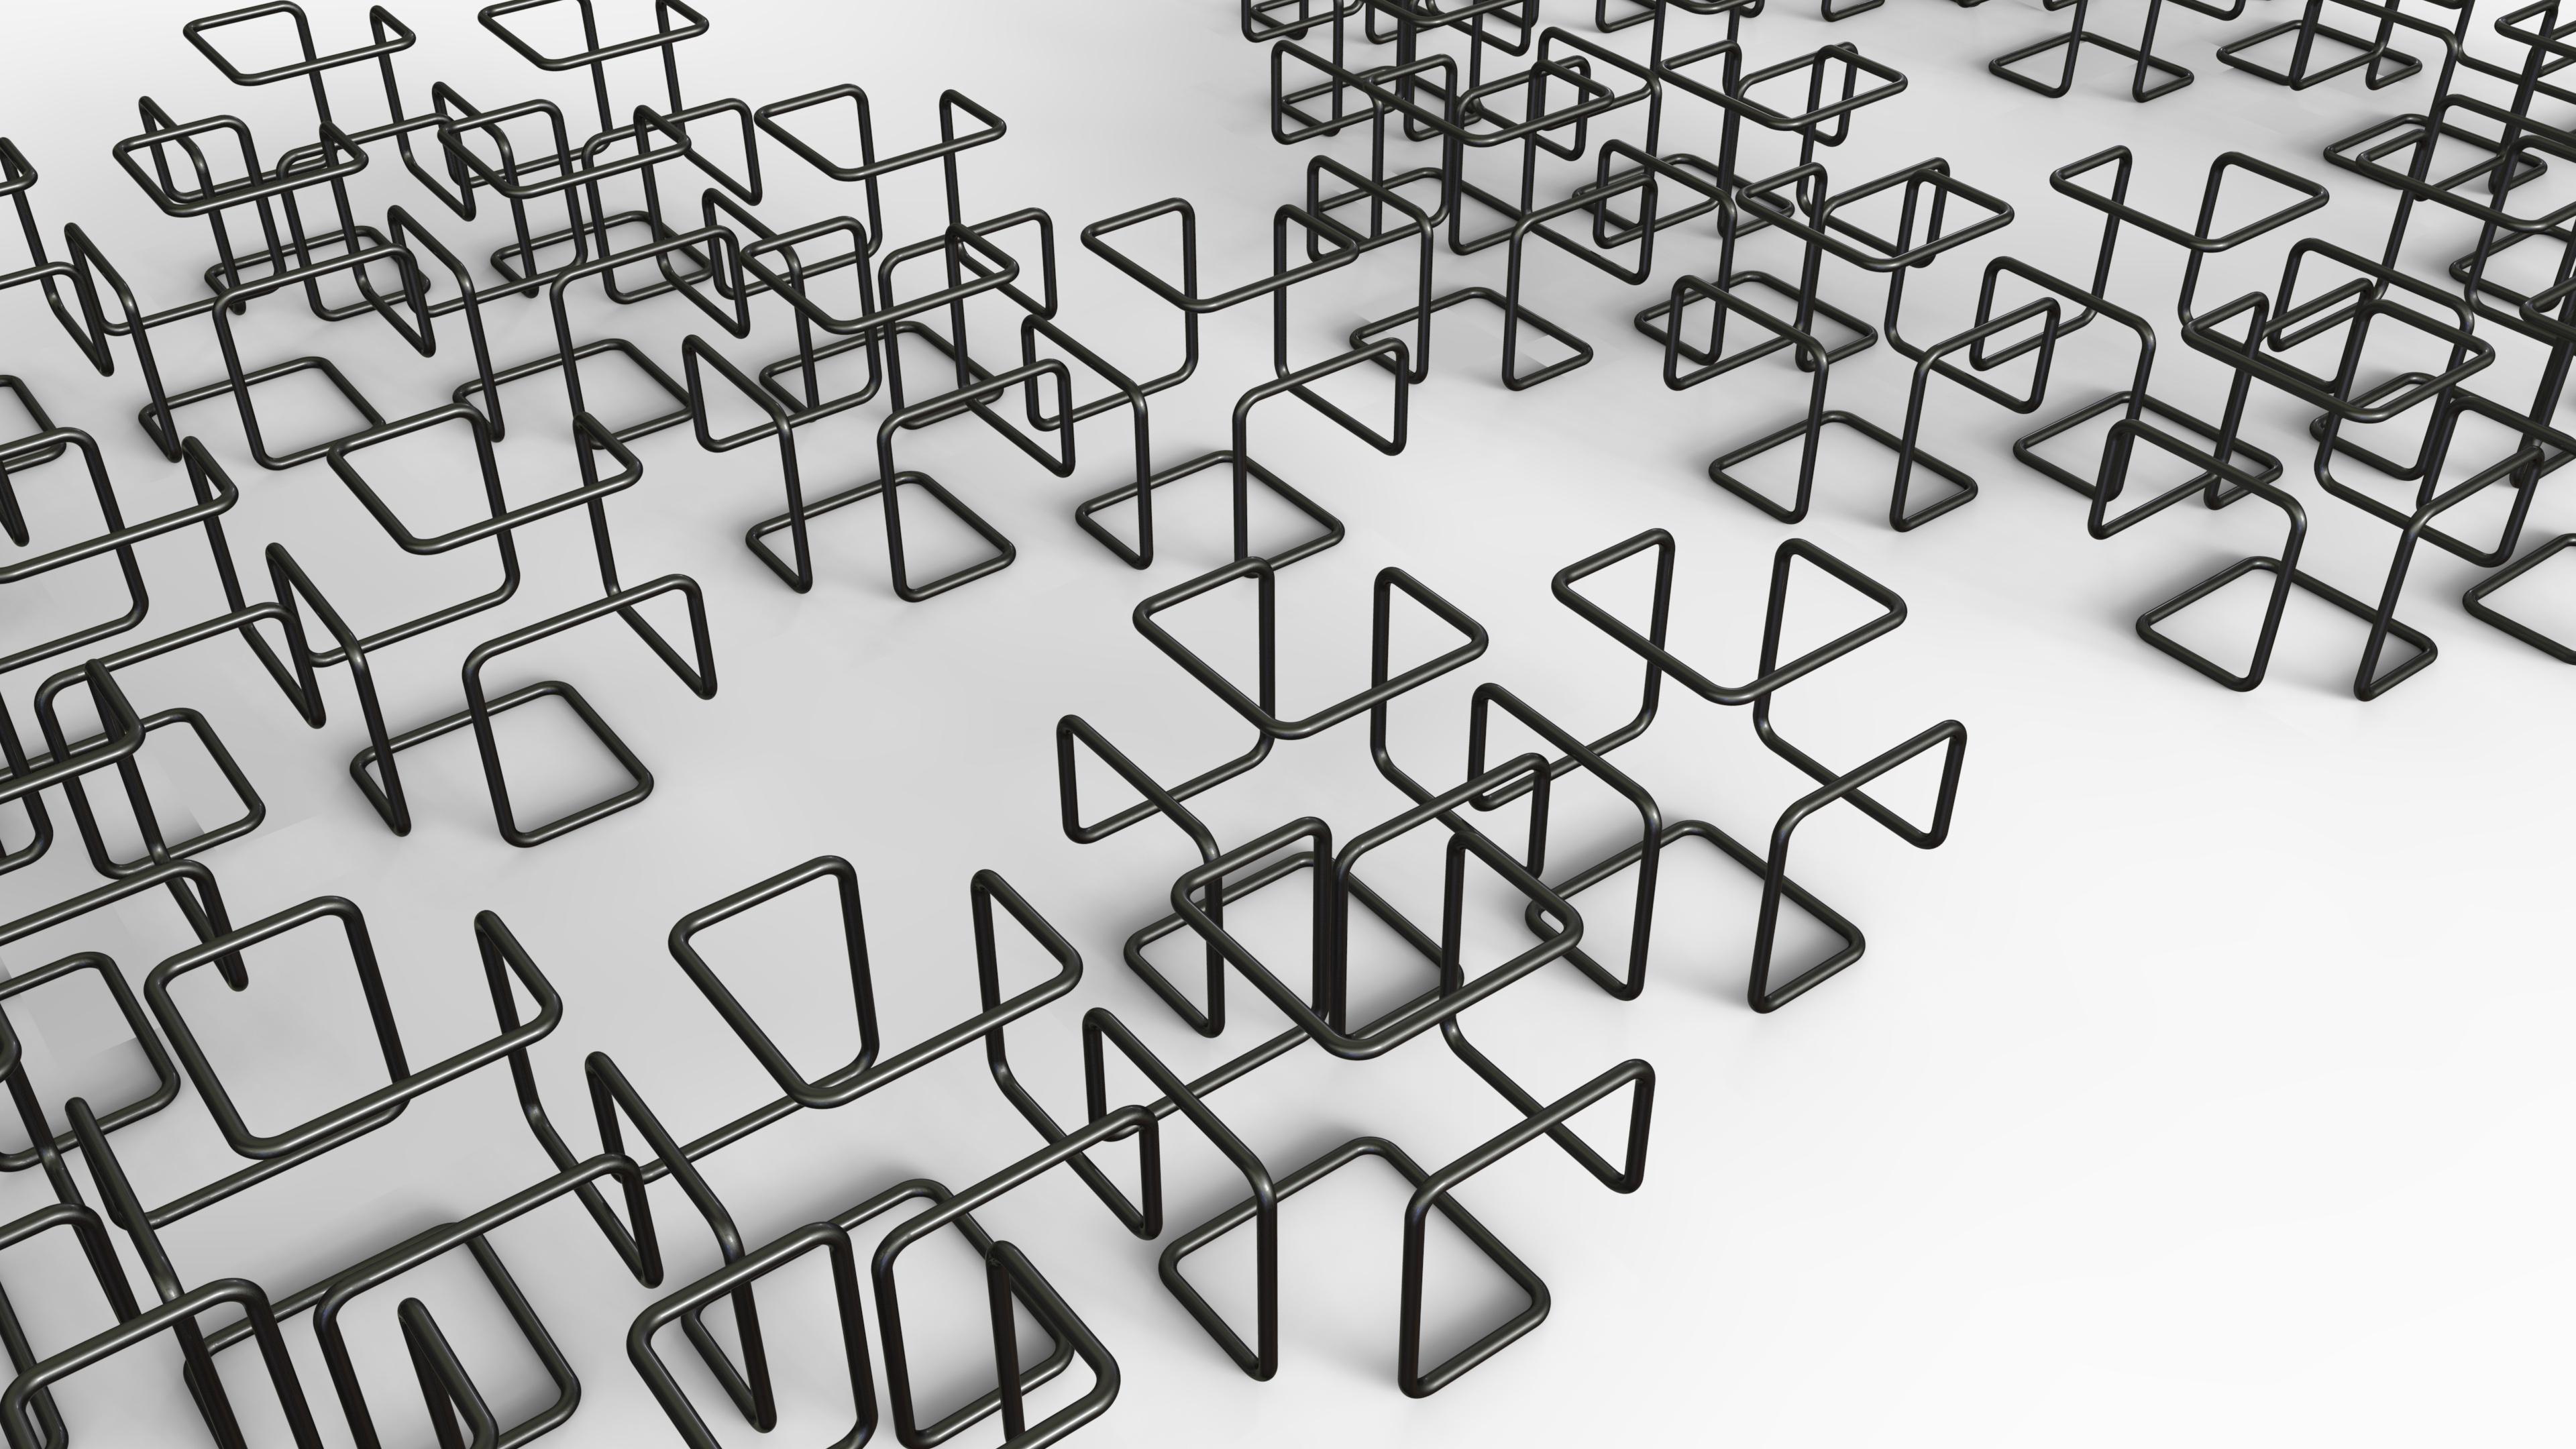 creo3_cubes-4K-3840x2160.jpg